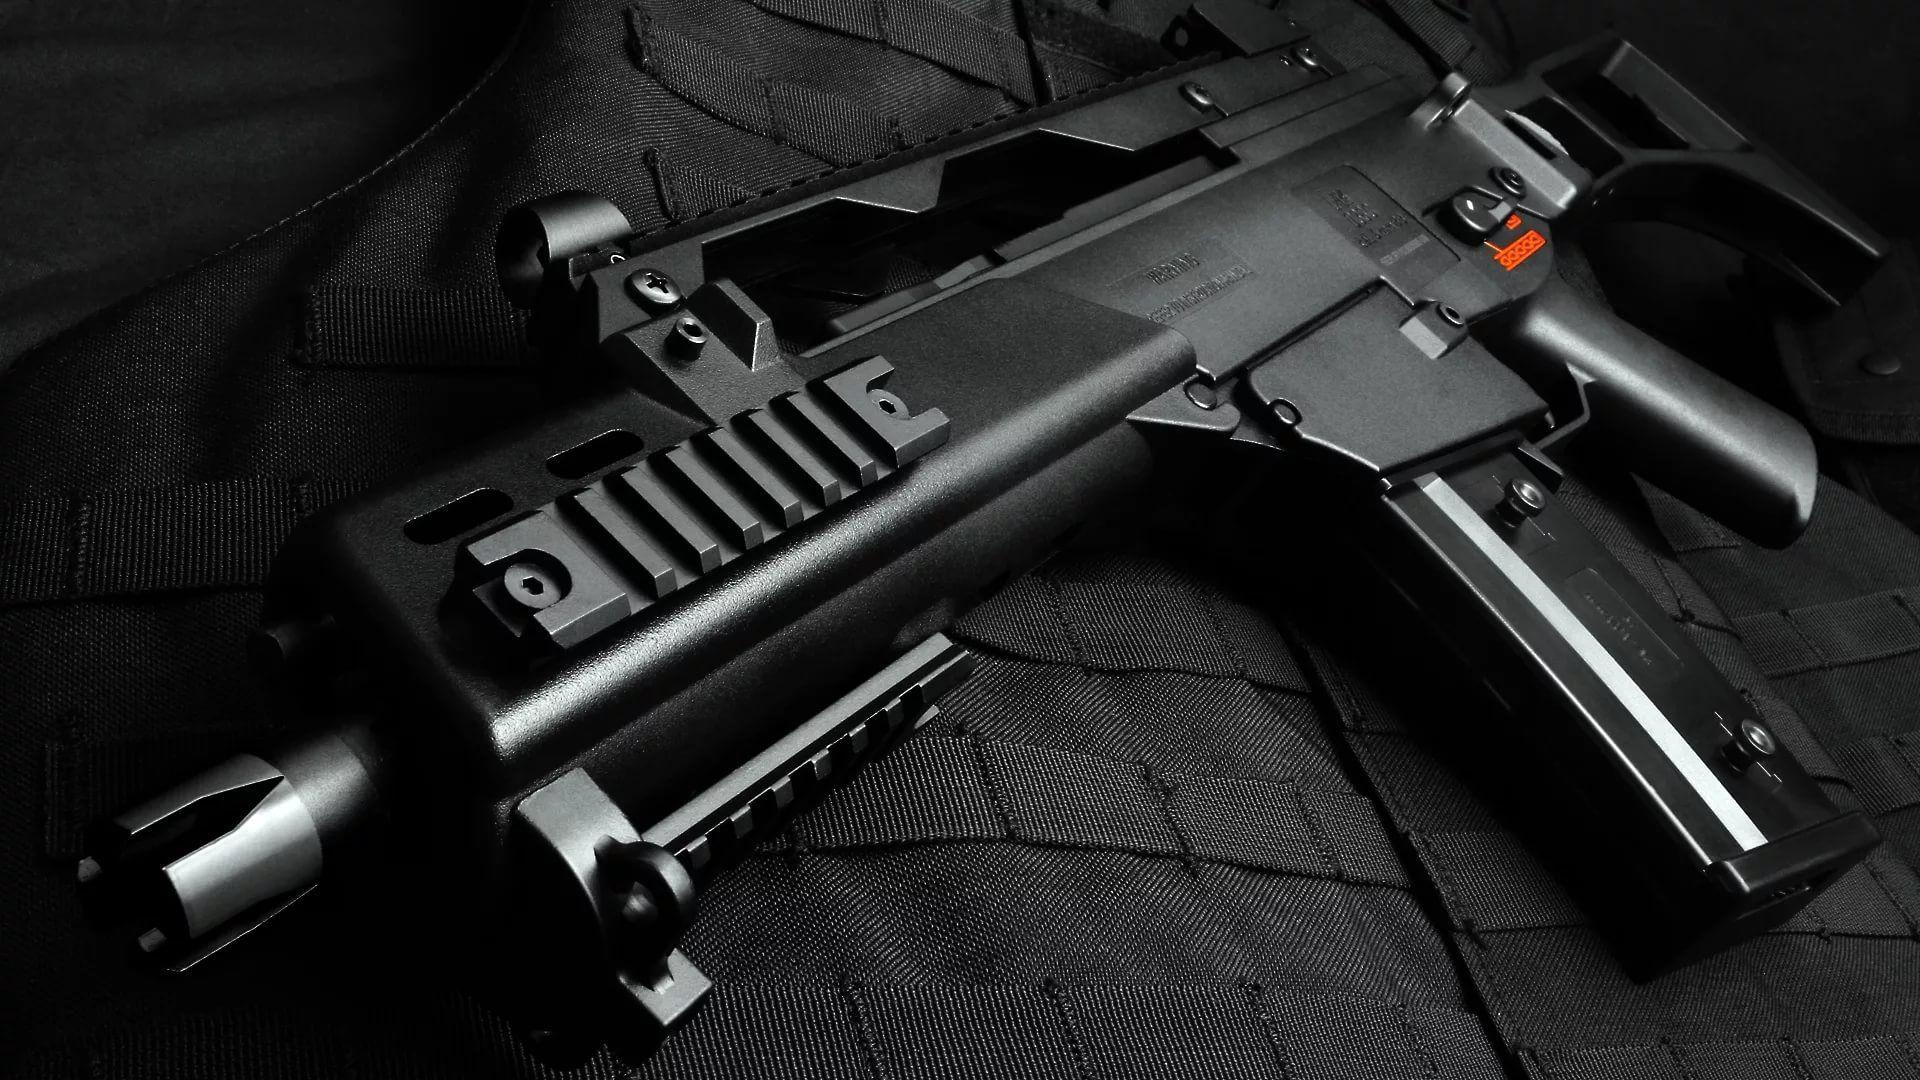 Gun For Desktop pc wallpaper